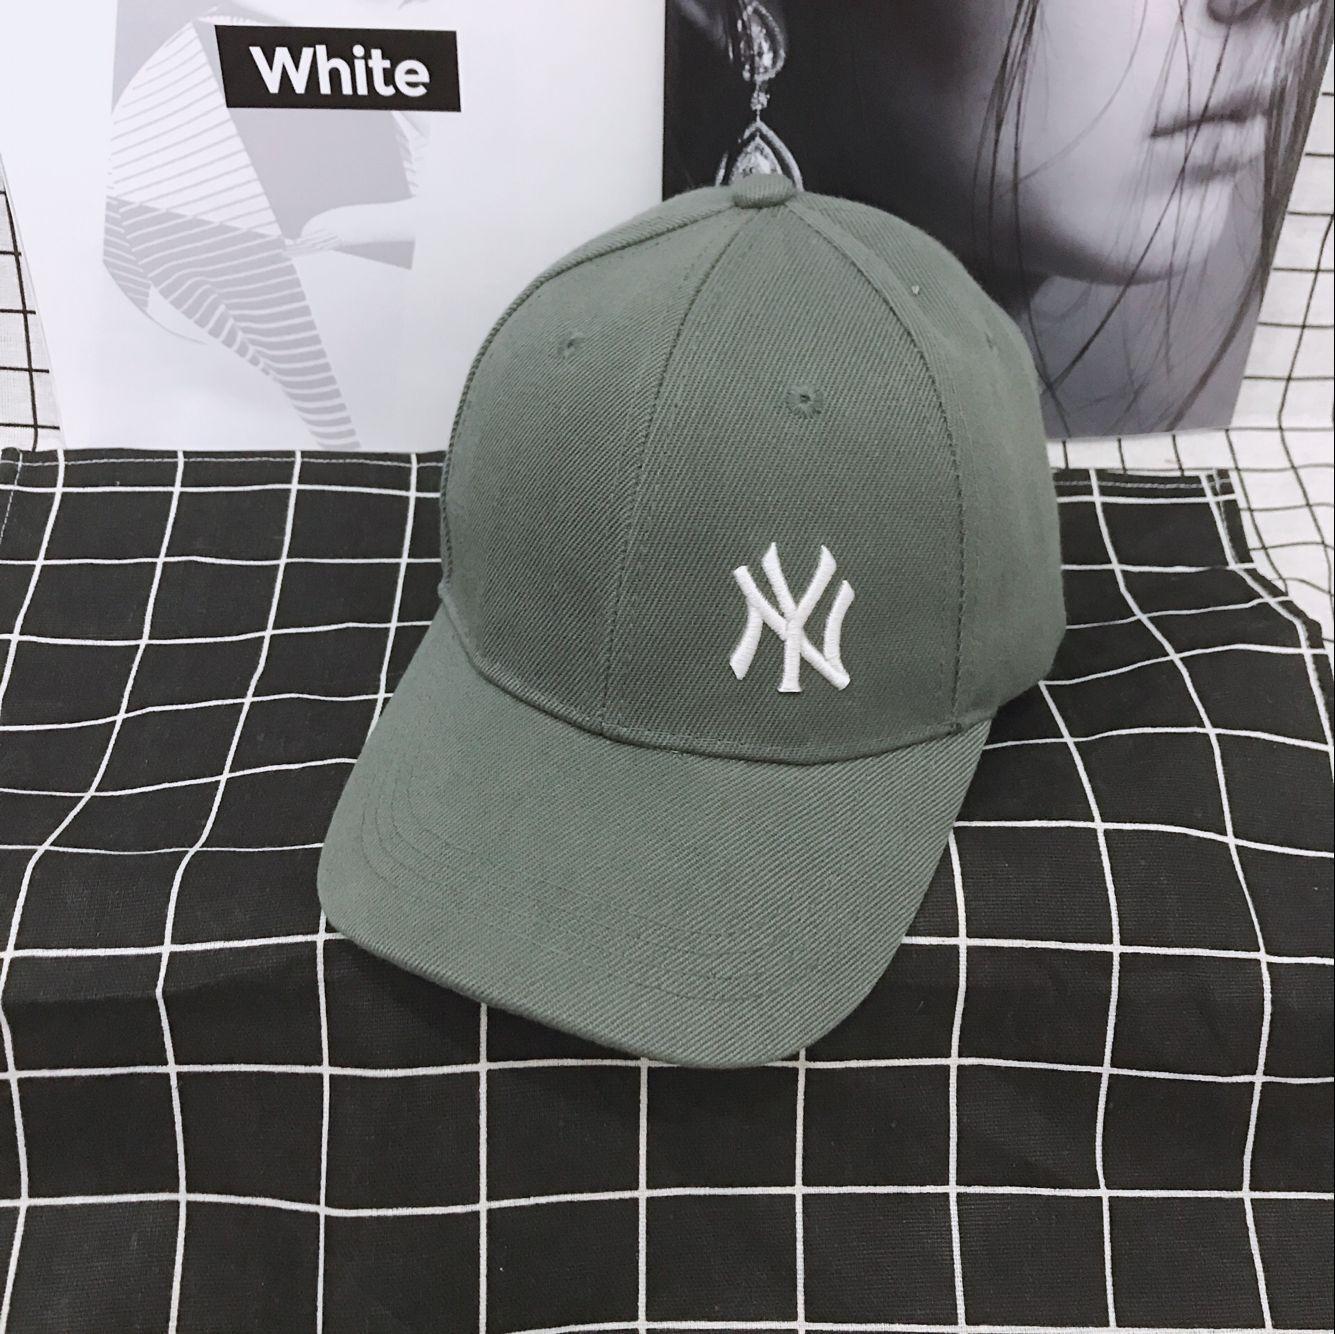 c317c5ef Hats for Men for sale - Mens Hats Online Deals & Prices in ...